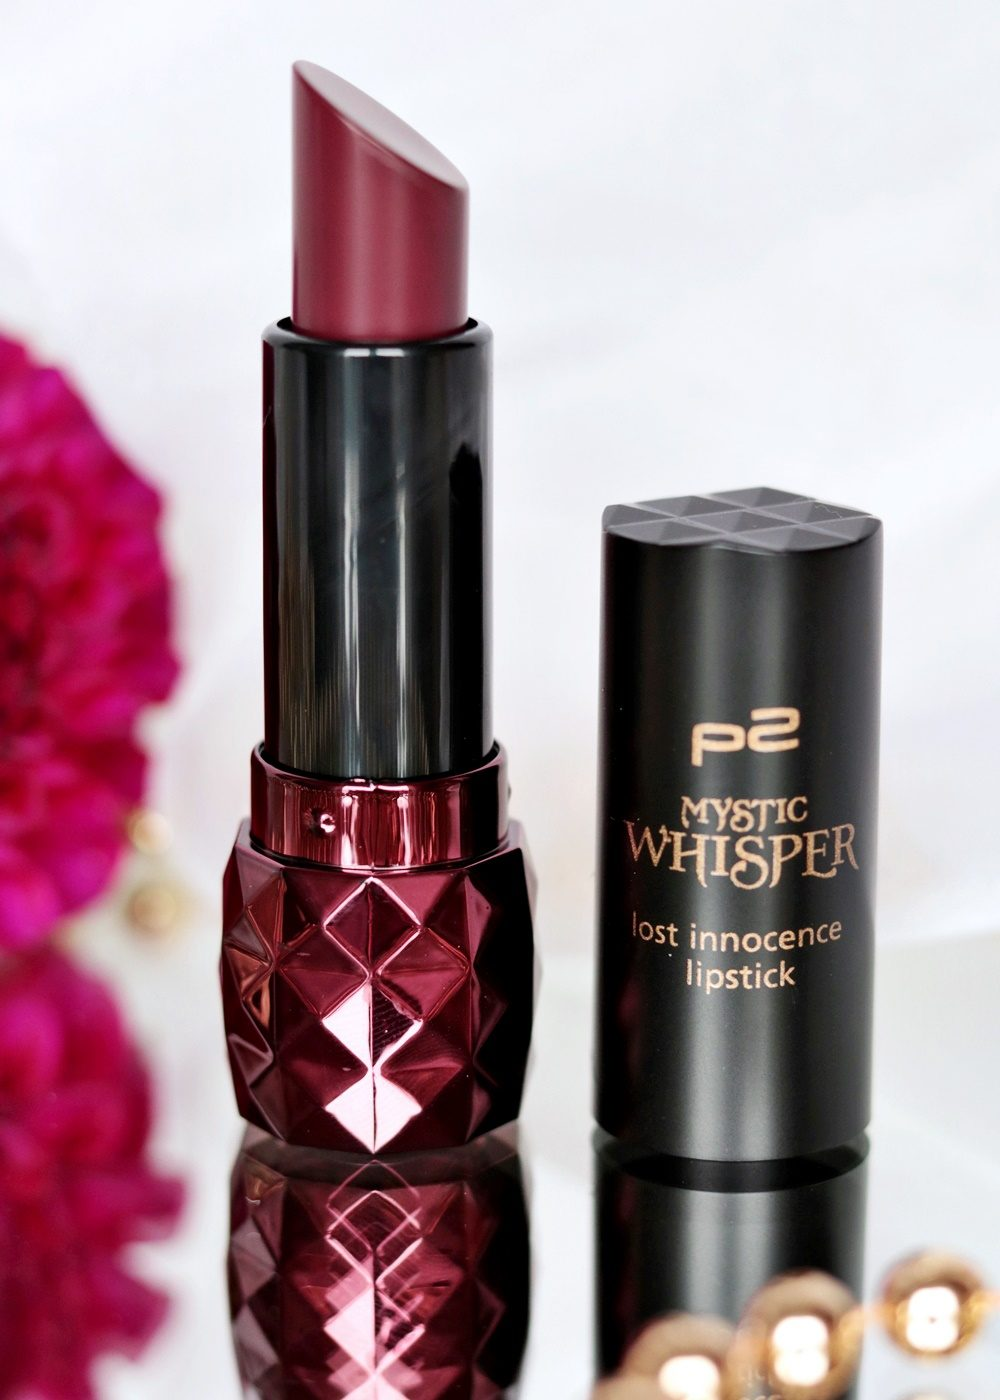 p2-mystic-whisper-lost-innocence-lipstick-lippenstift-2